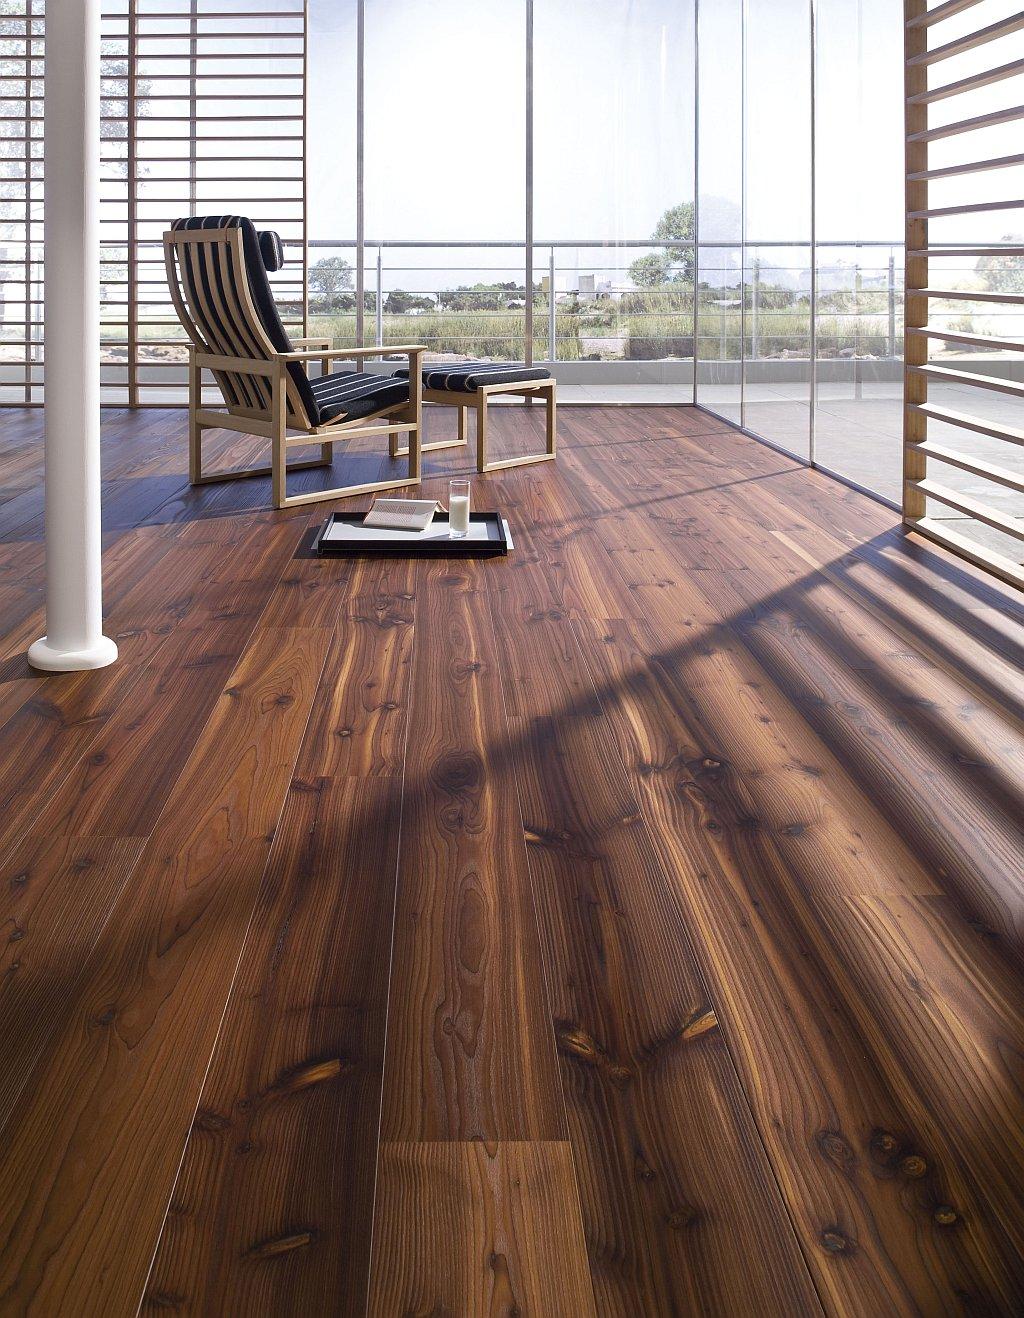 best hardwood flooring options choosing the best wood flooring for your home UGWYECF